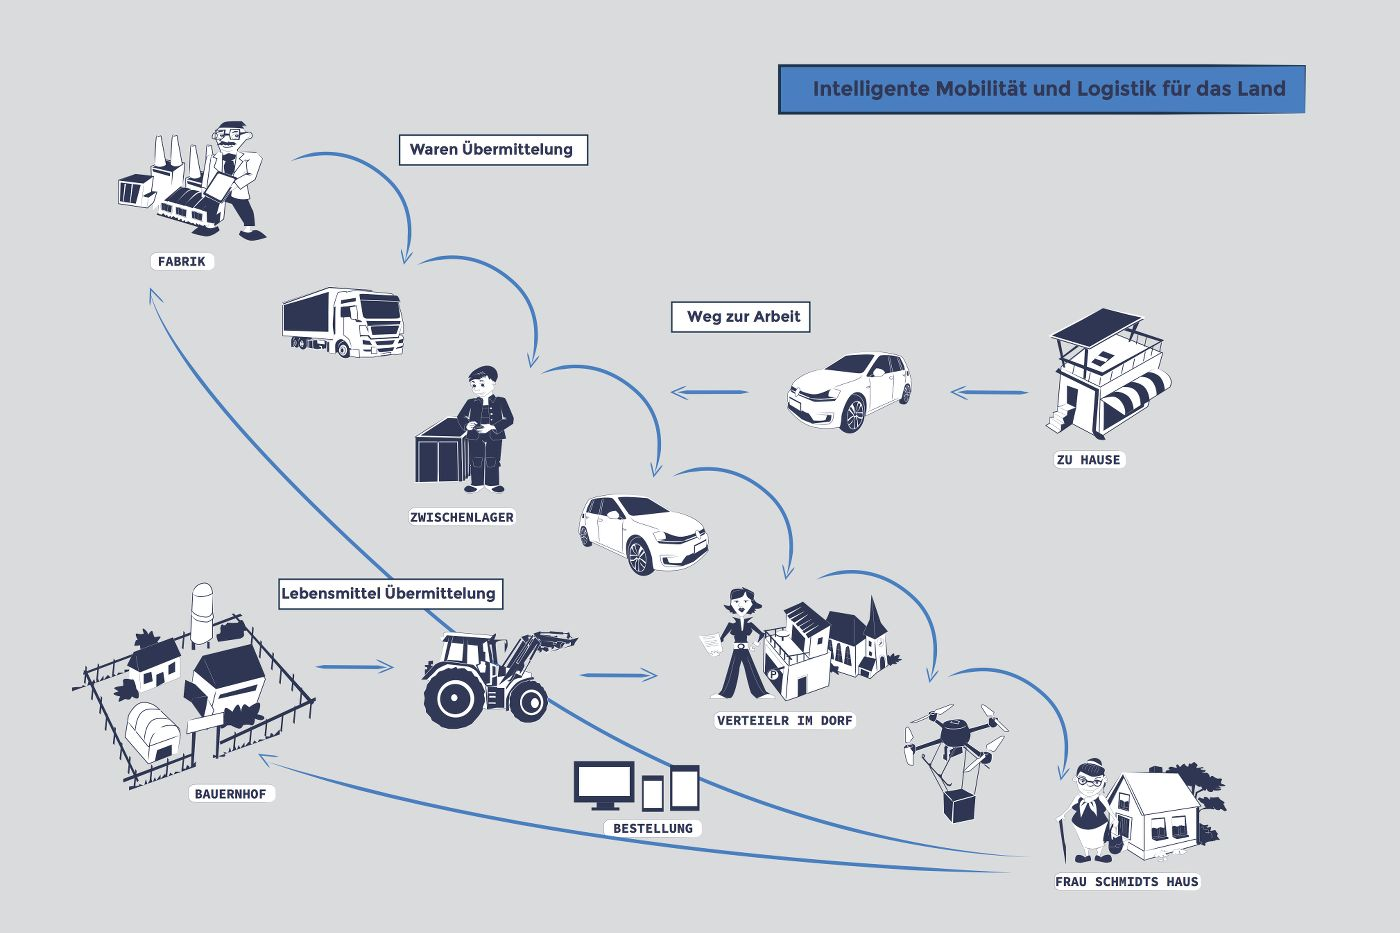 (C) Internet & Gesellschaft Collaboratory e.V.